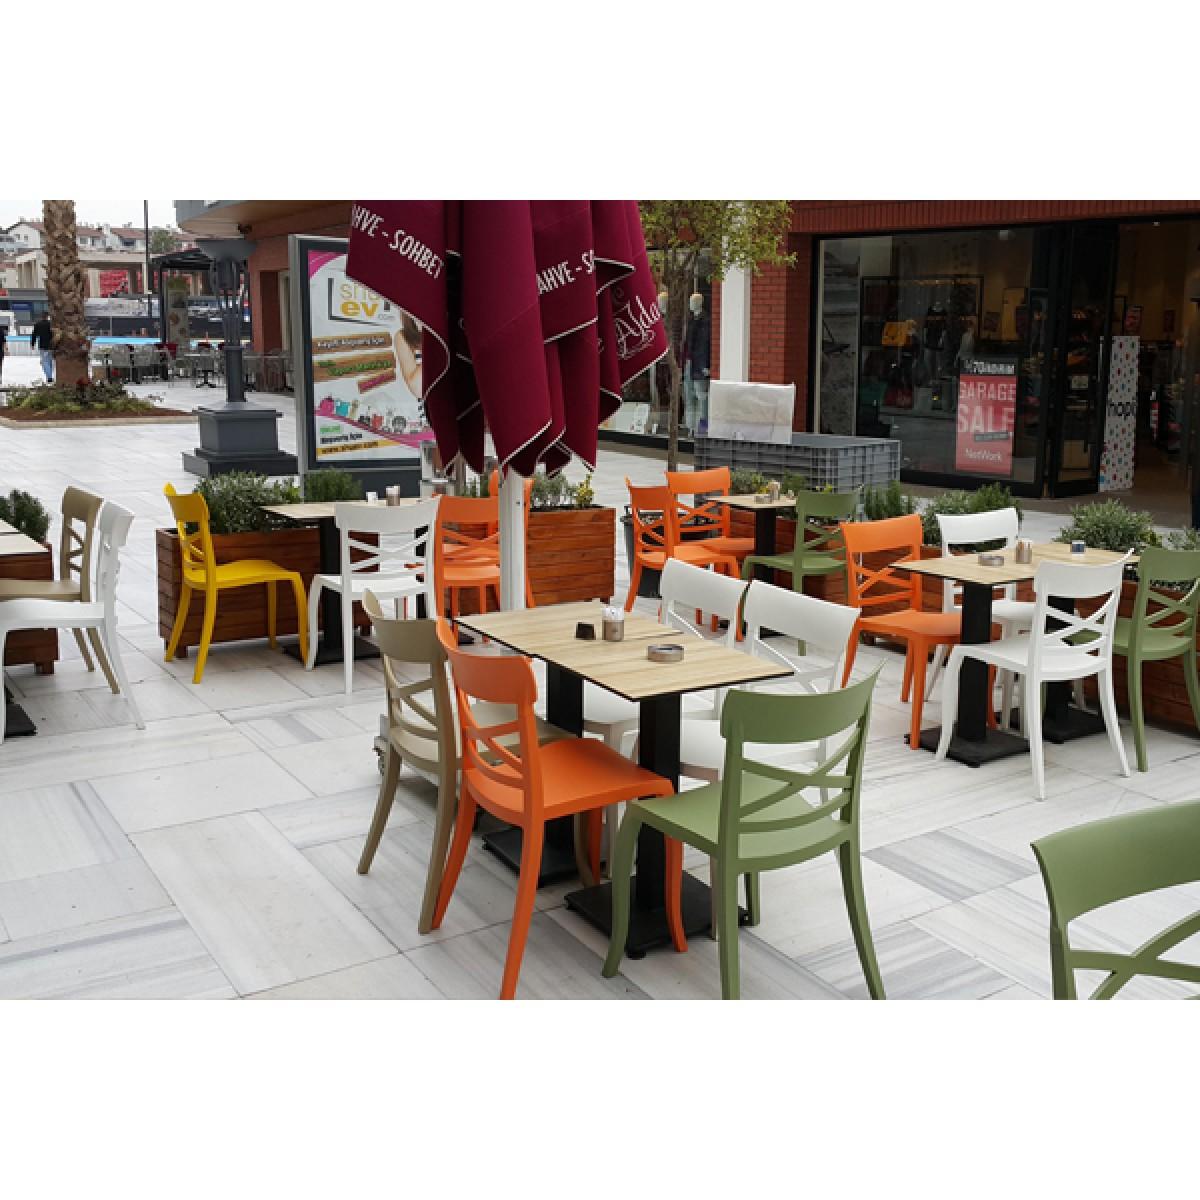 Gartenstuhl gelb stapelbar stuhl outdoor gelb kunststoff - Outdoor stuhle stapelbar ...